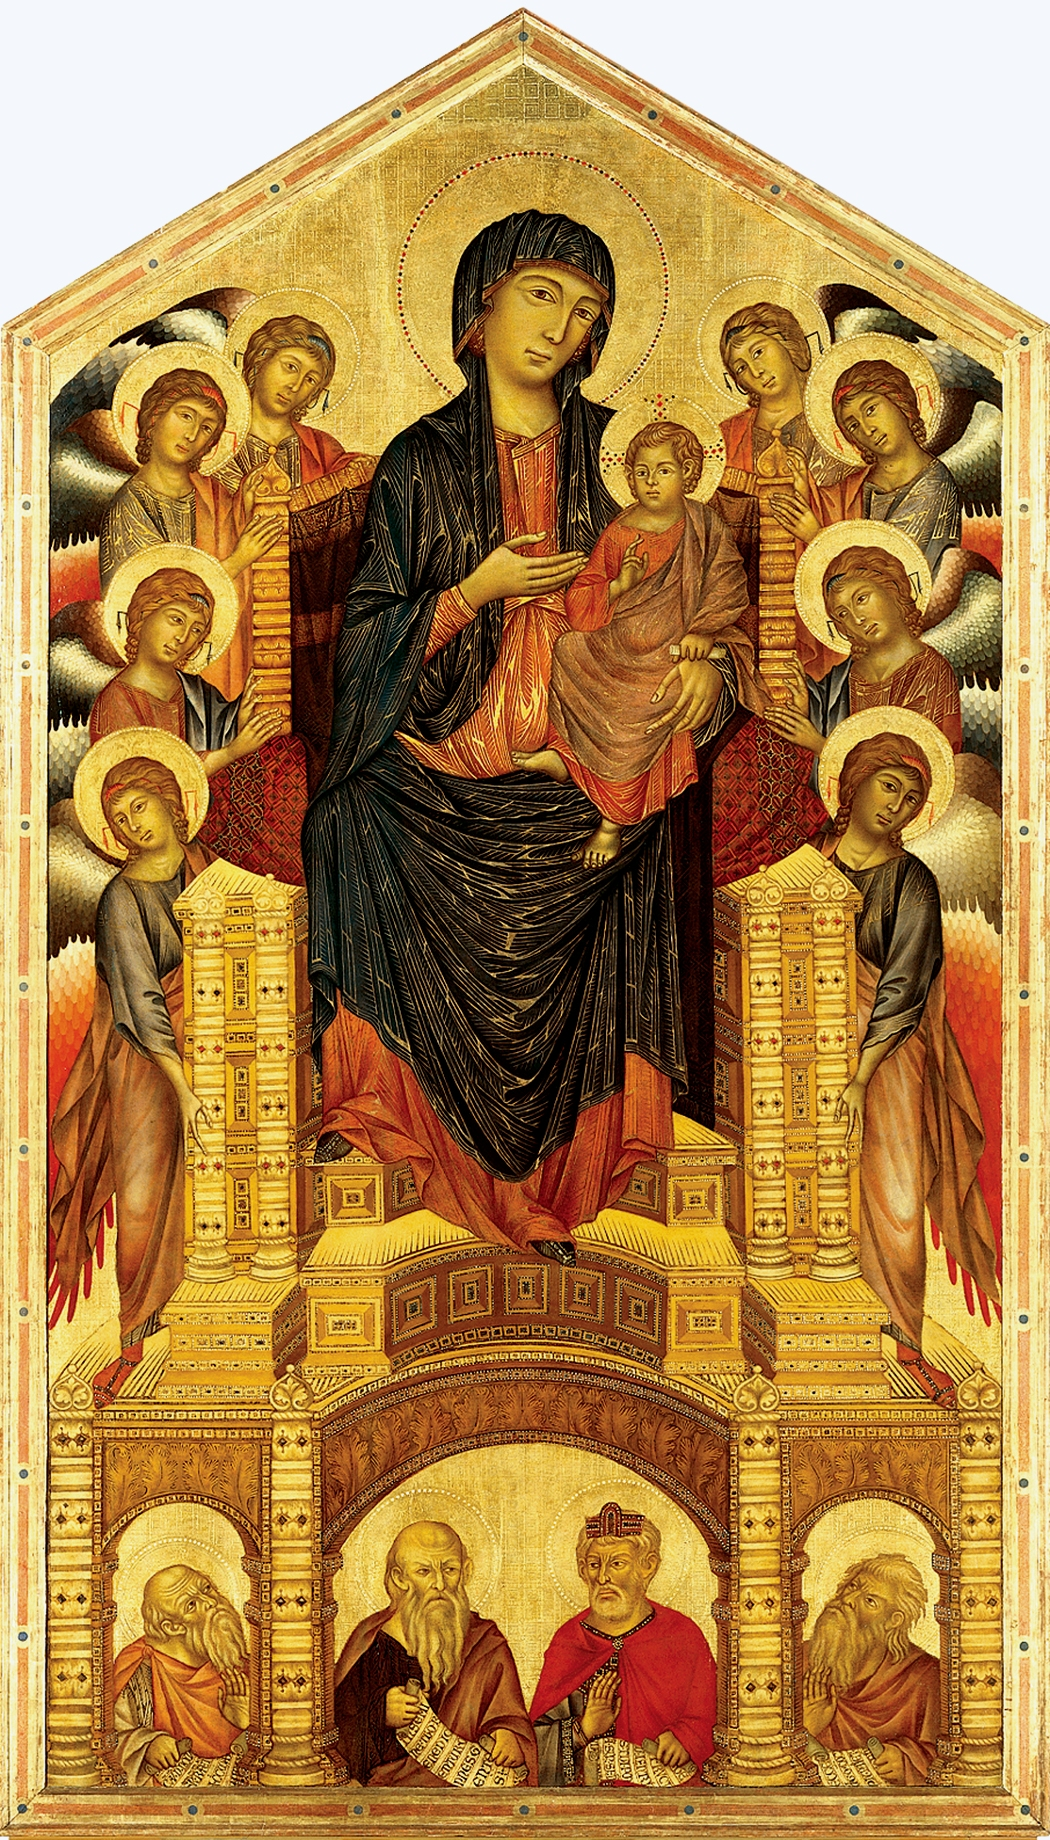 http://upload.wikimedia.org/wikipedia/commons/b/be/Cimabue_Trinita_Madonna.jpg